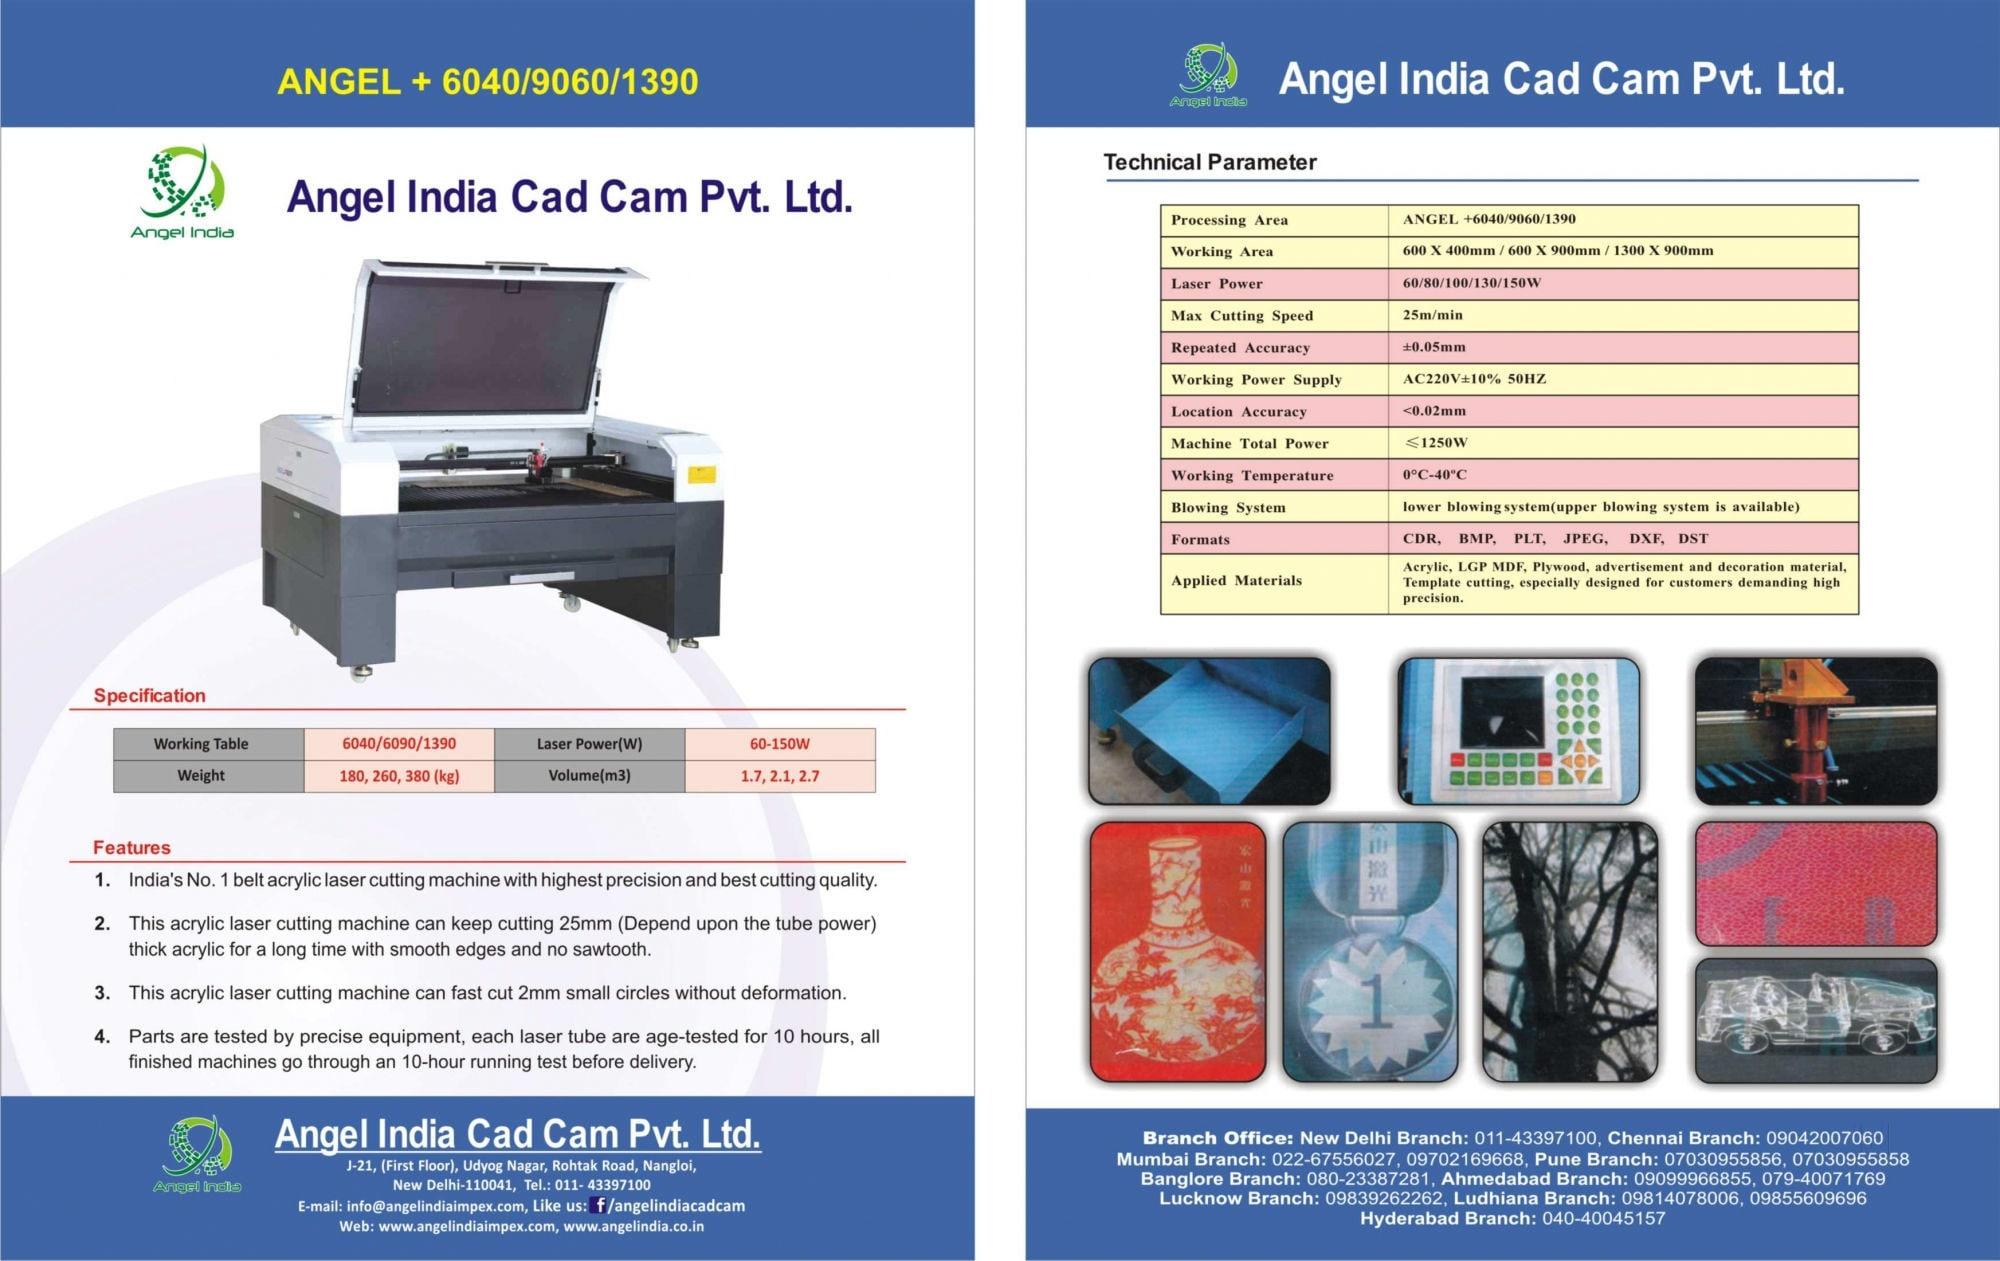 Top Laser Engraving Machine Dealers in Kolkata - Best Laser